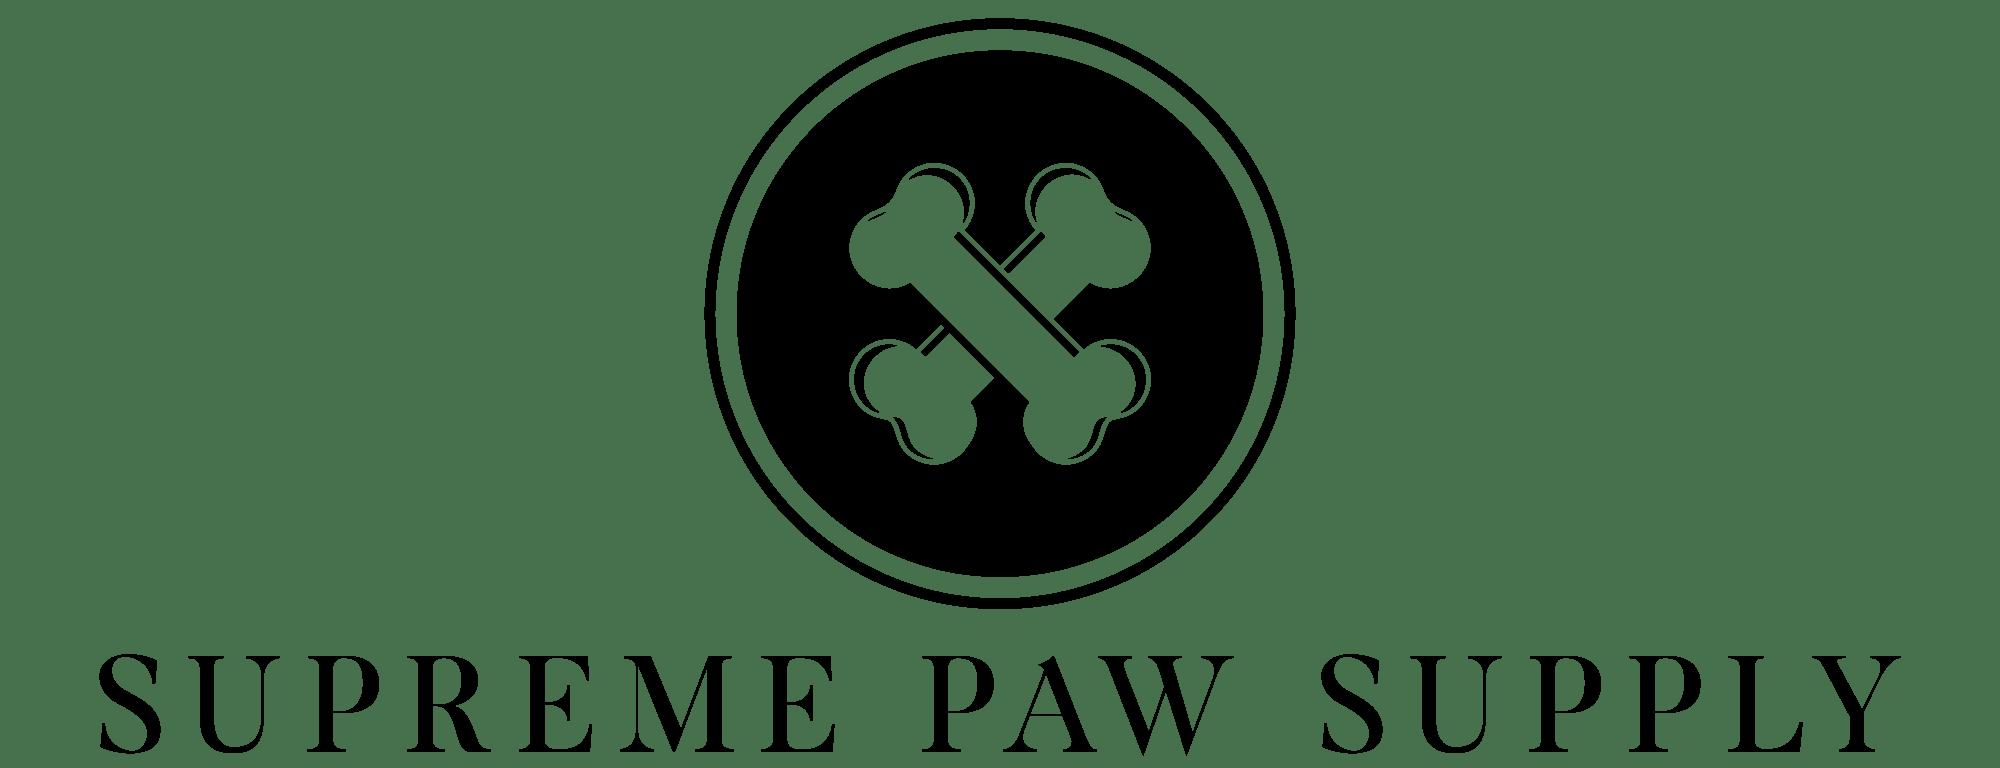 Supreme Paw Supply